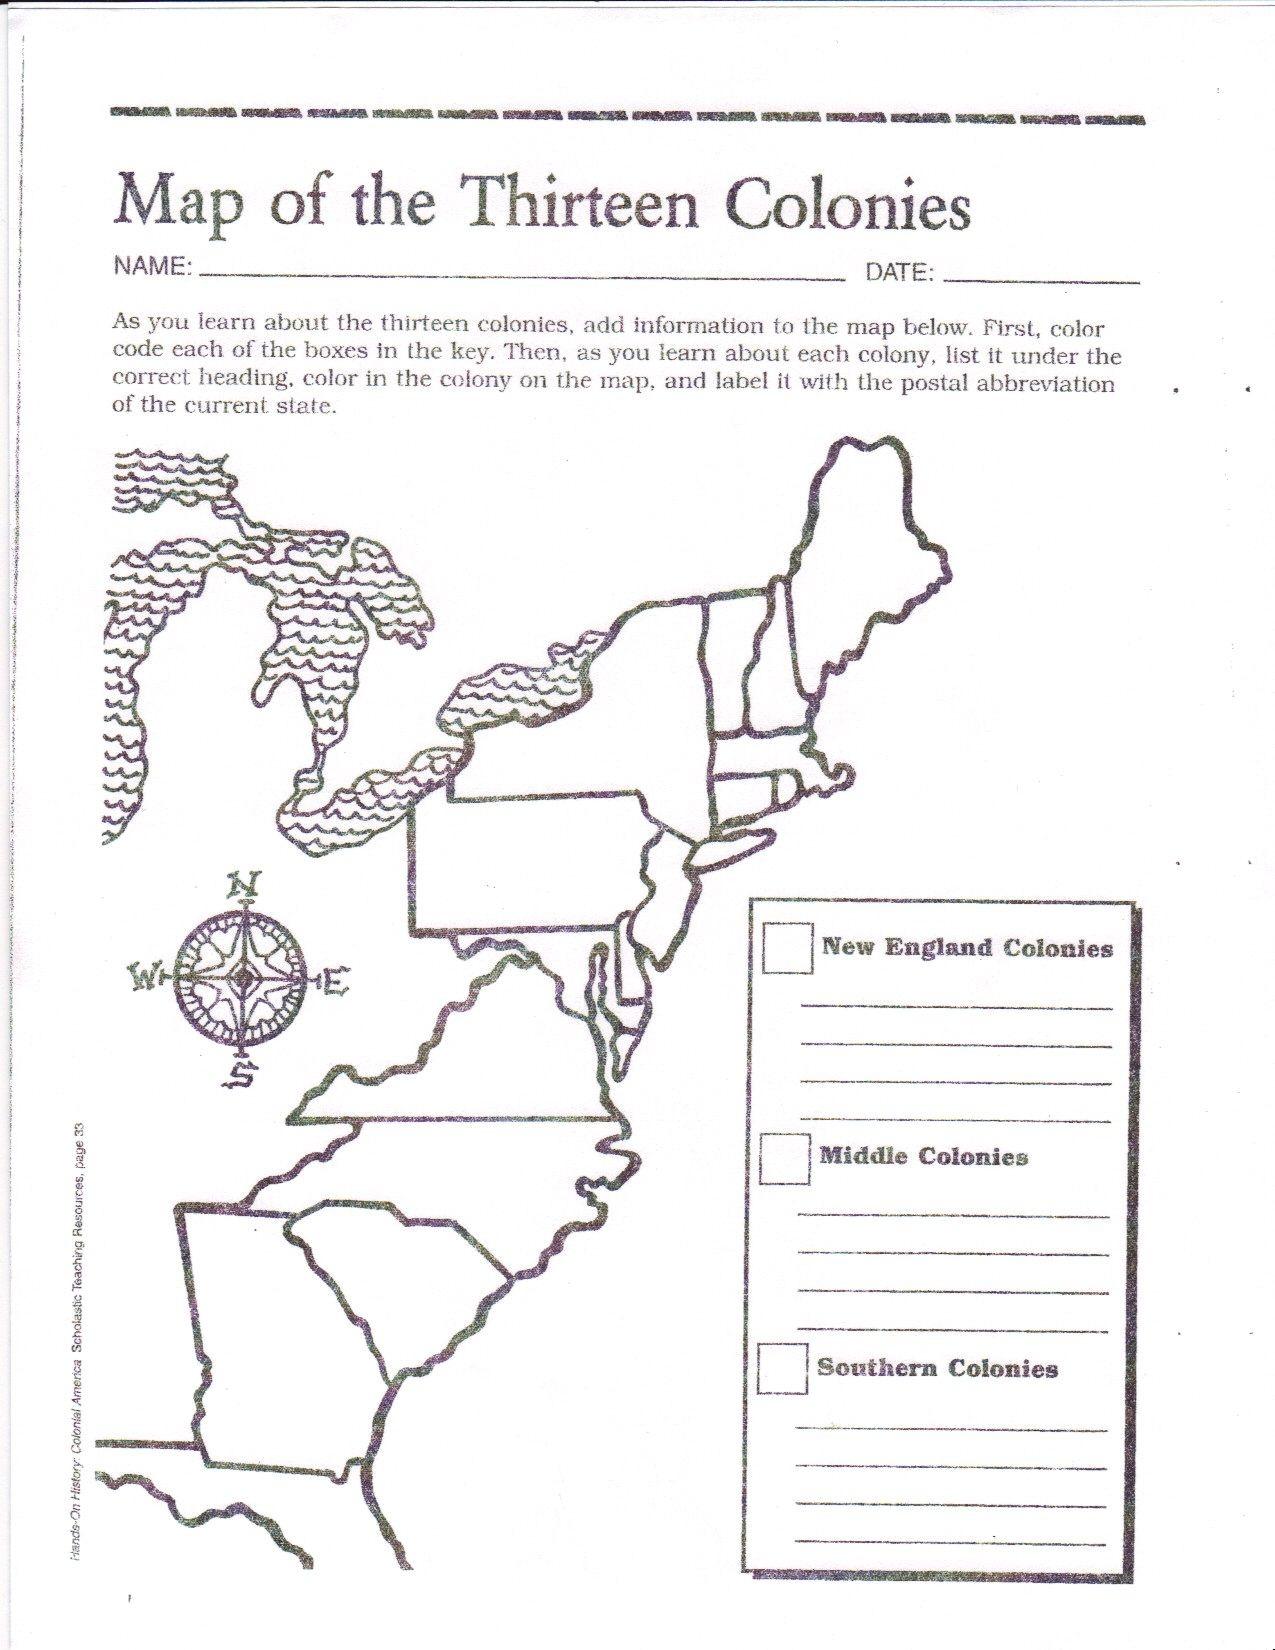 Free Printable 13 Colonies Map … | Activities | 7Th G… - 13 Colonies Blank Map Printable